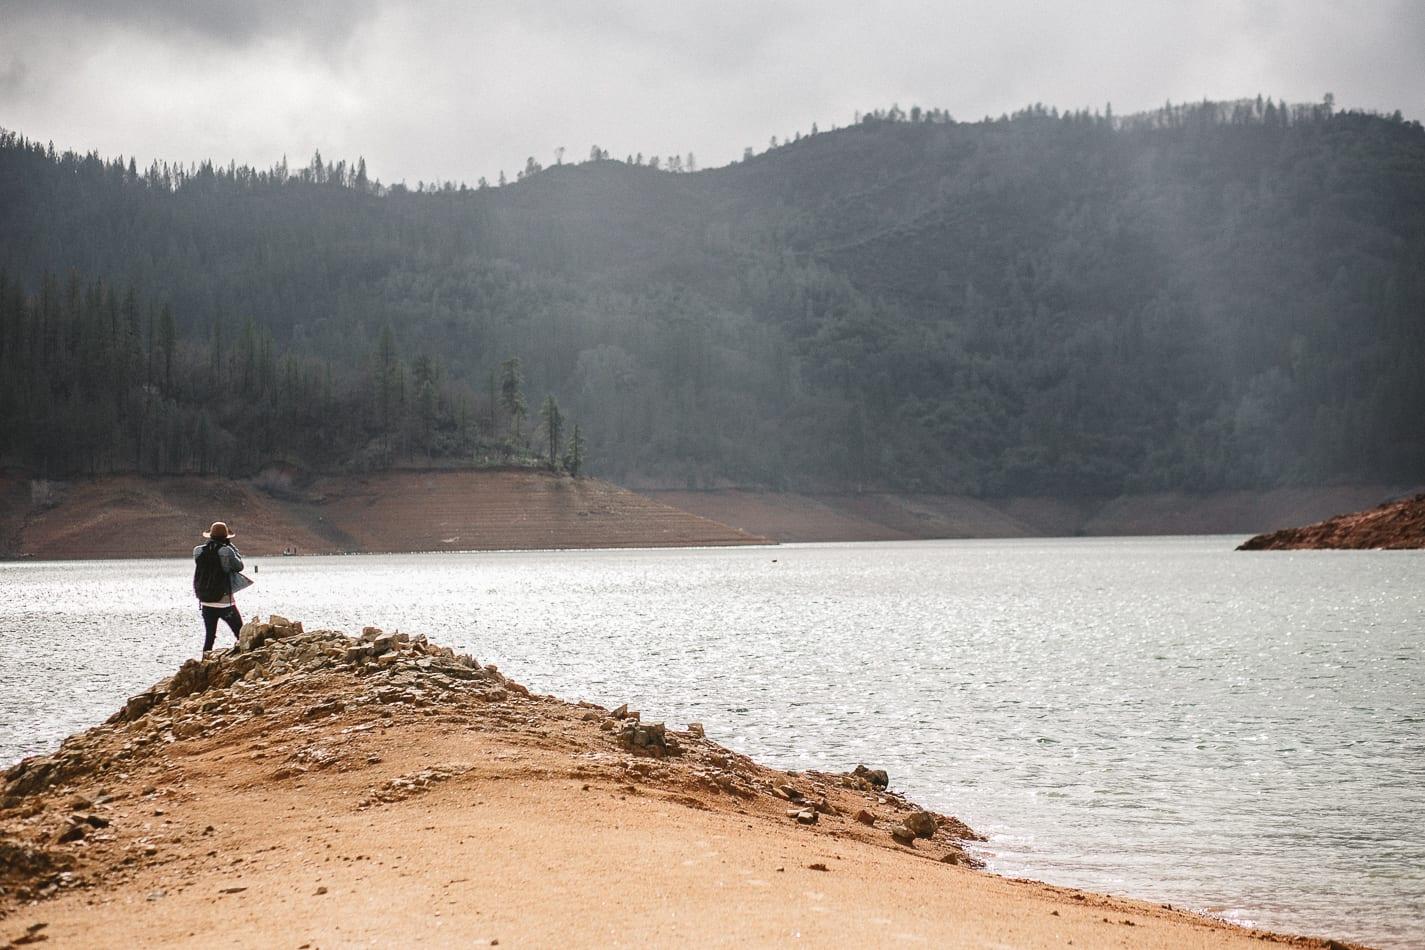 shasta-lake-redding-california-lifestyle-portrait-photographer-9